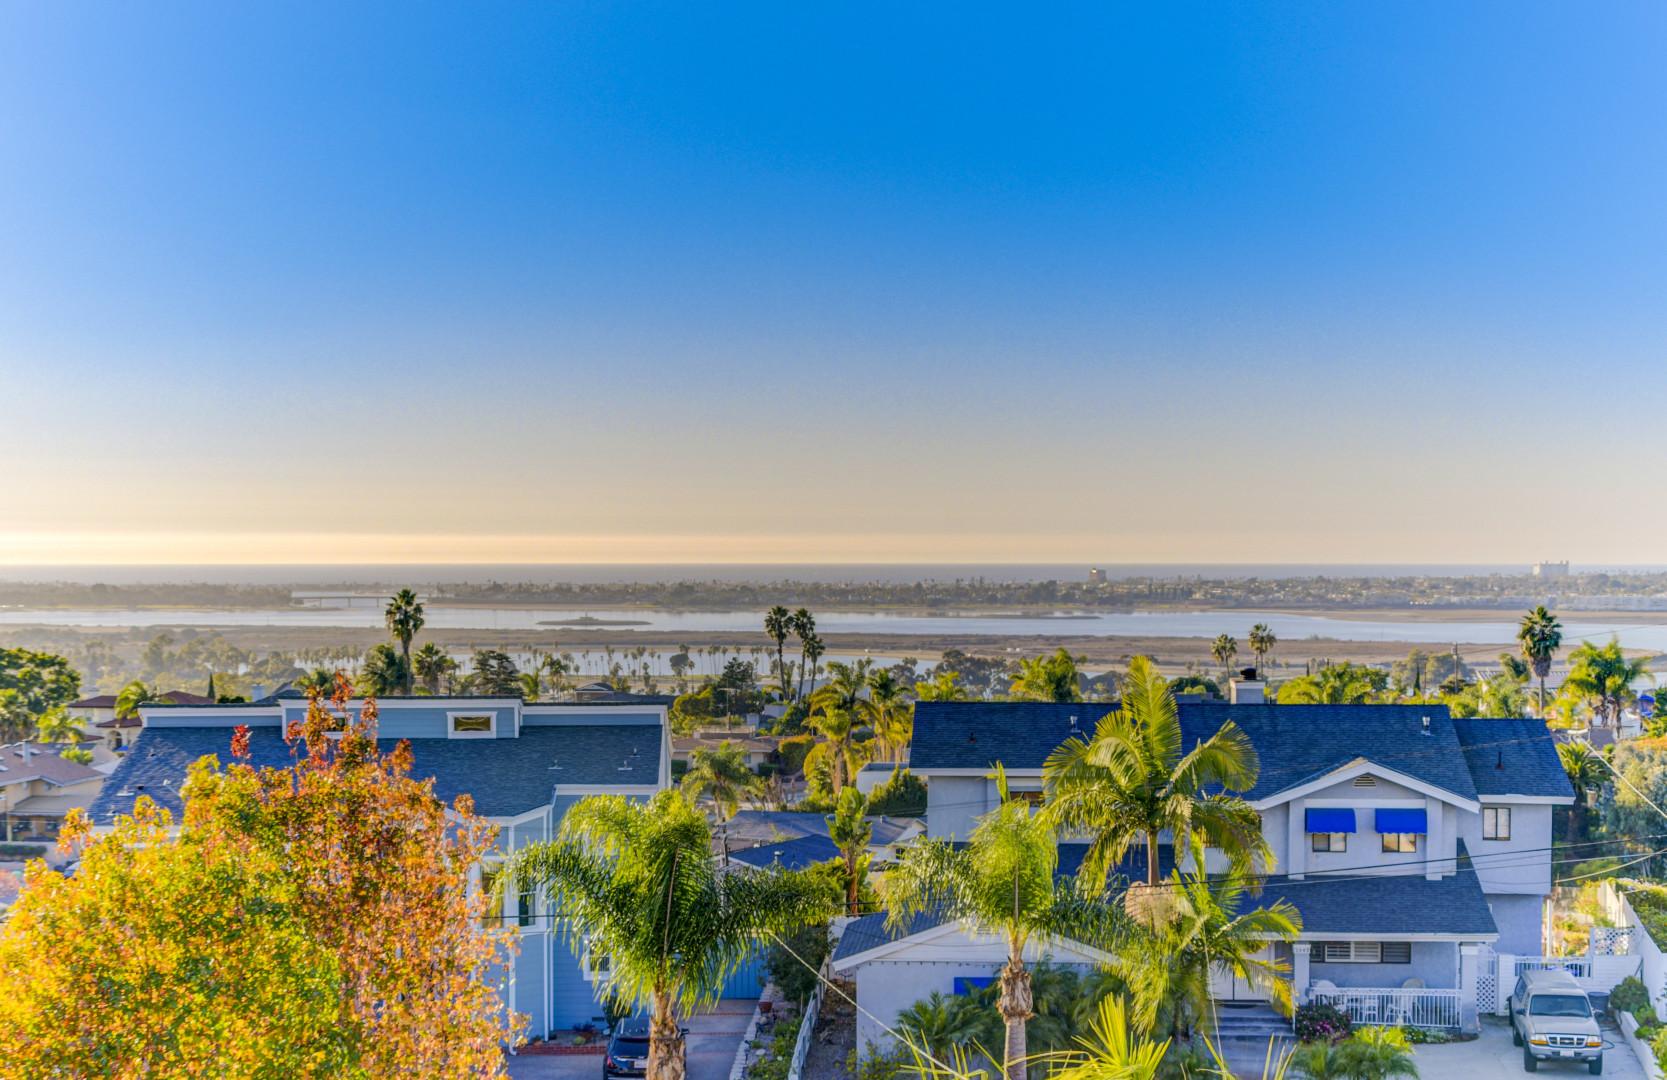 2254 Penrose St San Diego, CA 92110